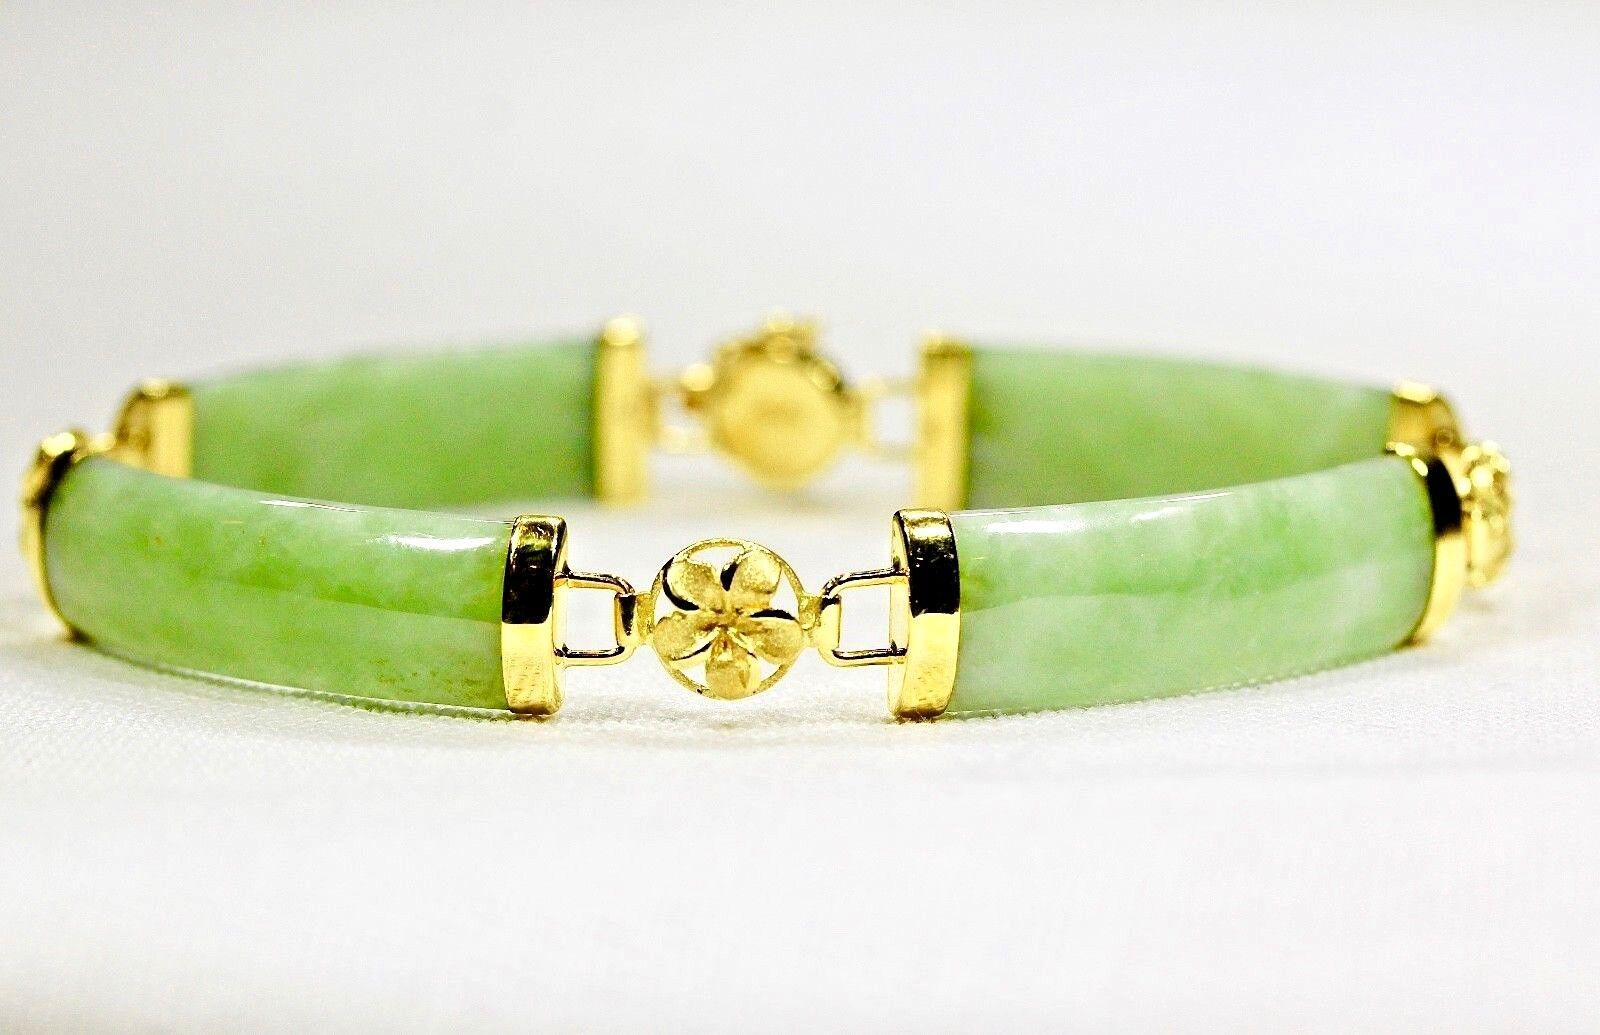 Jade Link Plumeria Bracelet Jewelry 14kt gold Green Translucent Quality Handmade